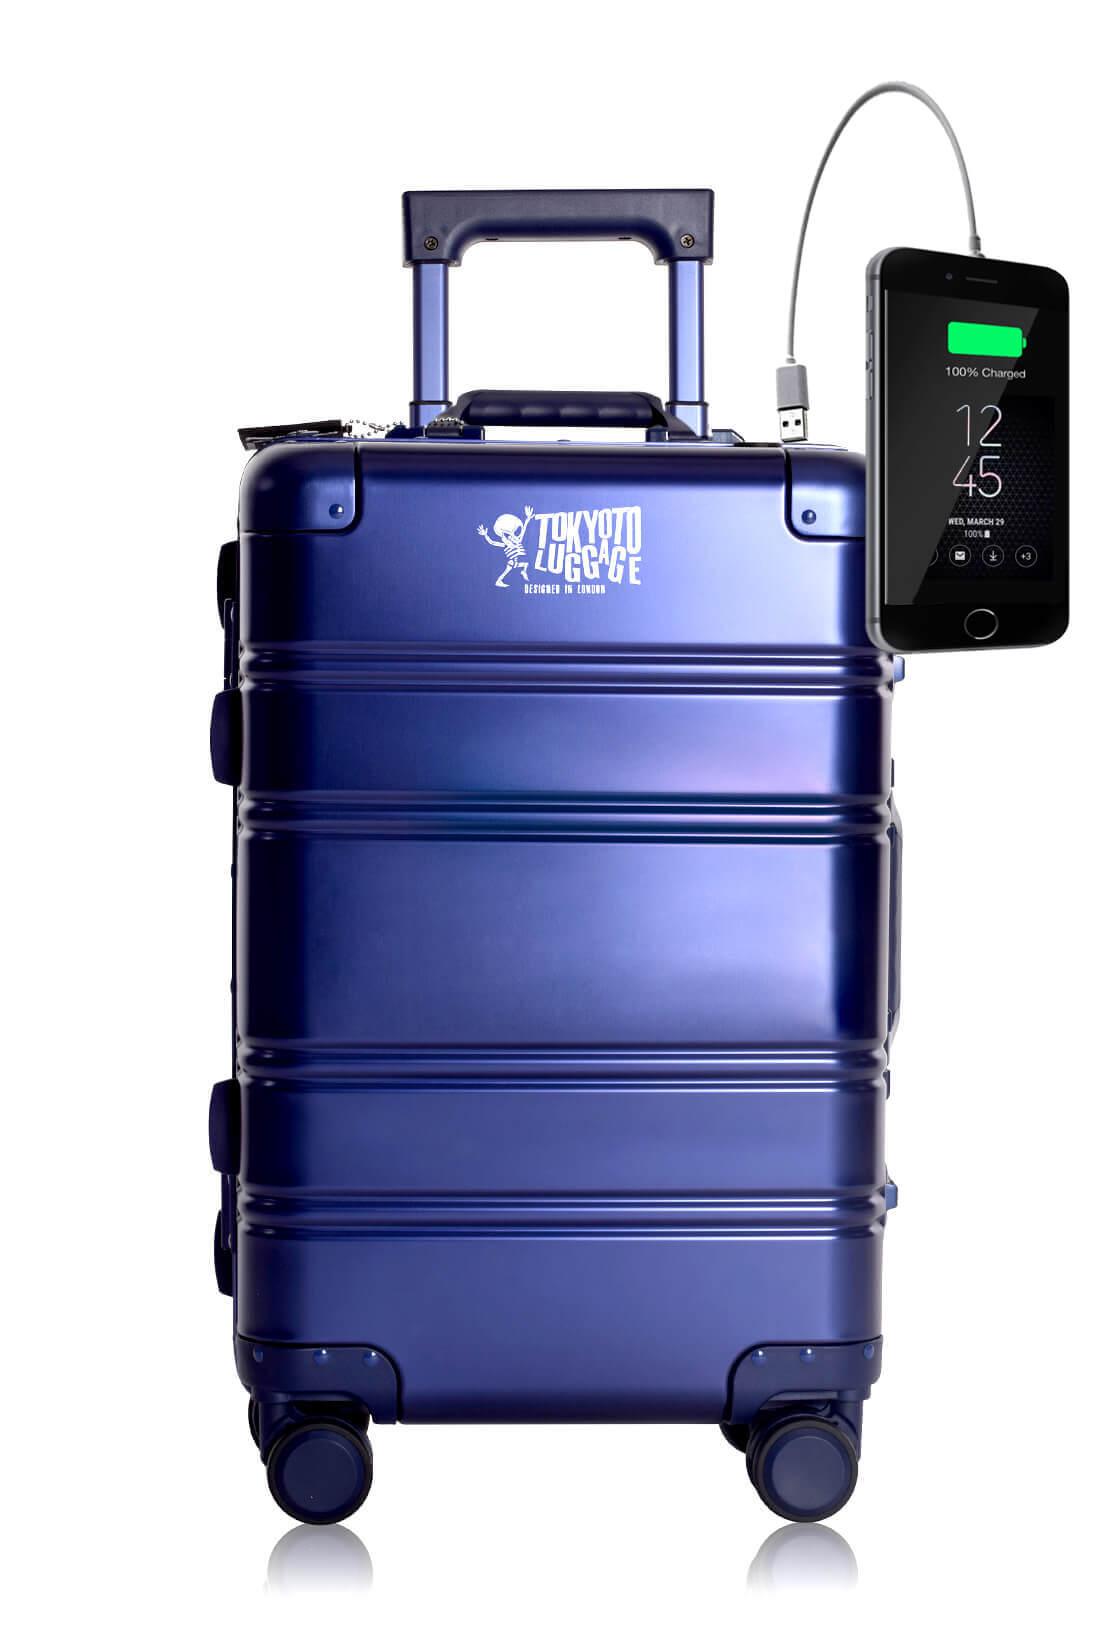 Metal Carry-on Luggage Hartschalen Trolley Koffer Rollkoffer aus hochwertiger Aluminium Legierung mit 4 Rollen und zweifachem TSA-Zahlenschloss BLUE SMALL LOGO